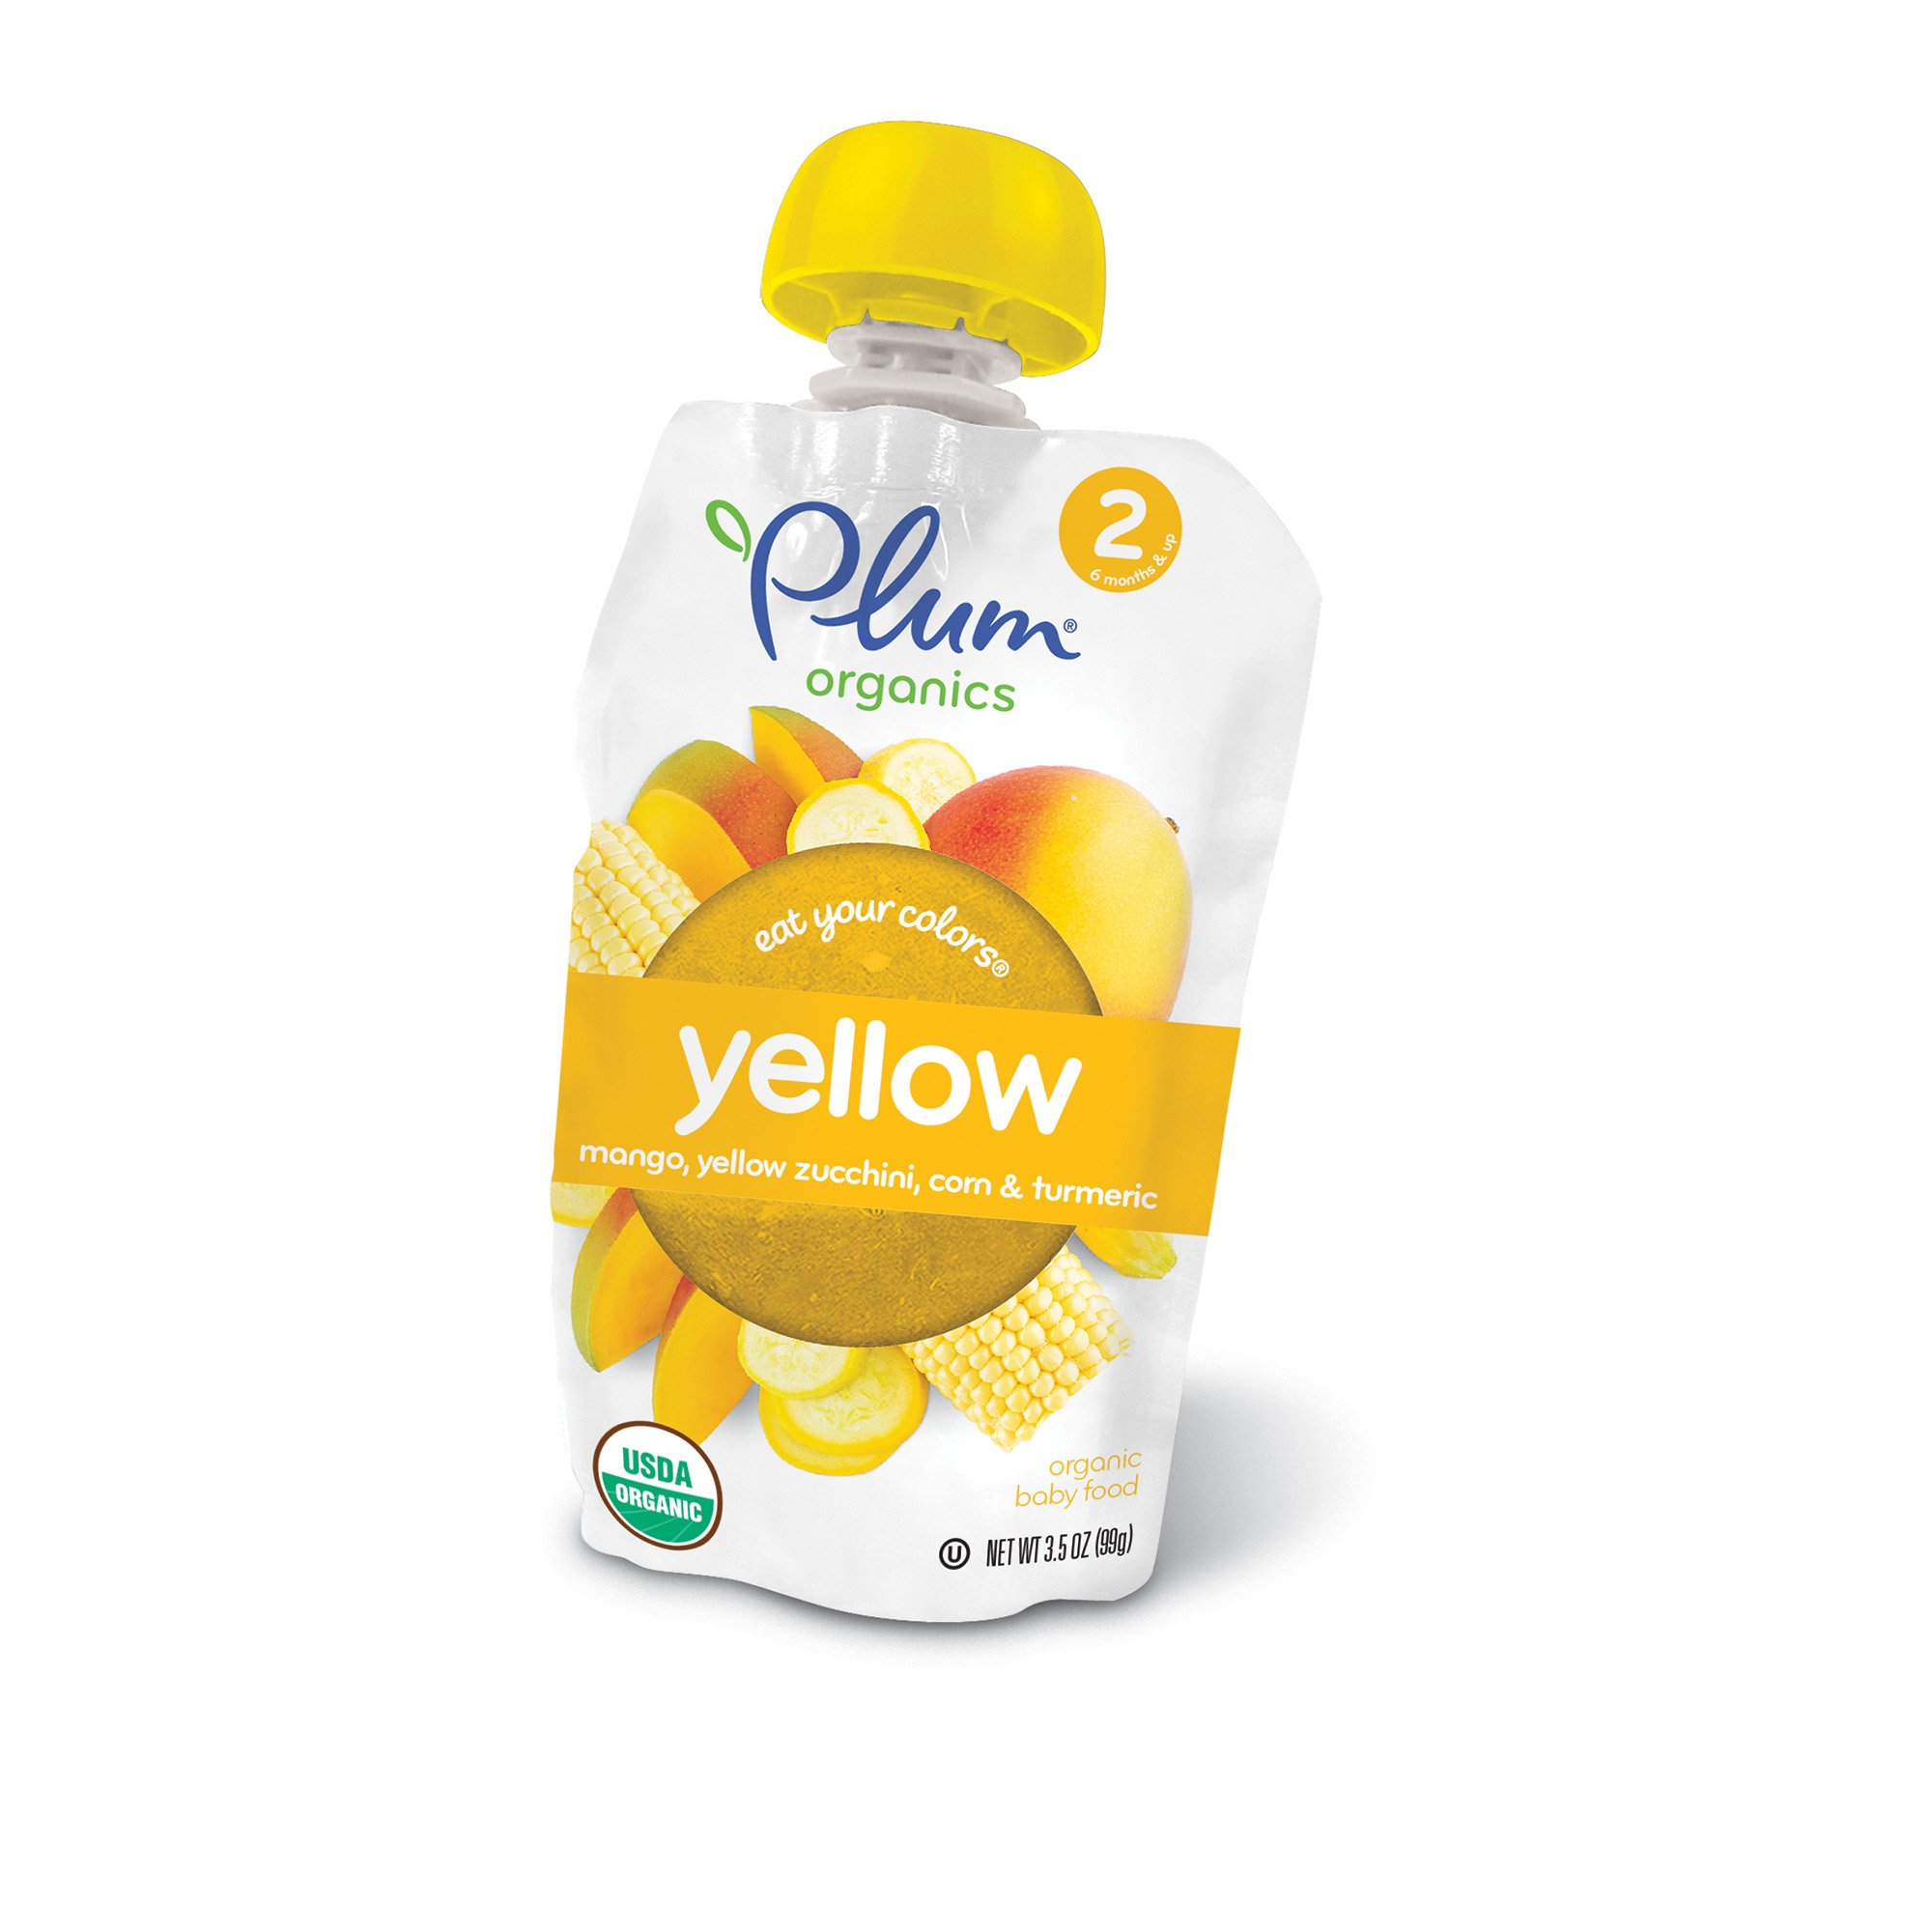 Plum Organics Stage 2 Eat Your Colors Yellow, Organic Baby Food, Mango, Yellow Zucchini, Corn & Turmeric, 3.5 oz